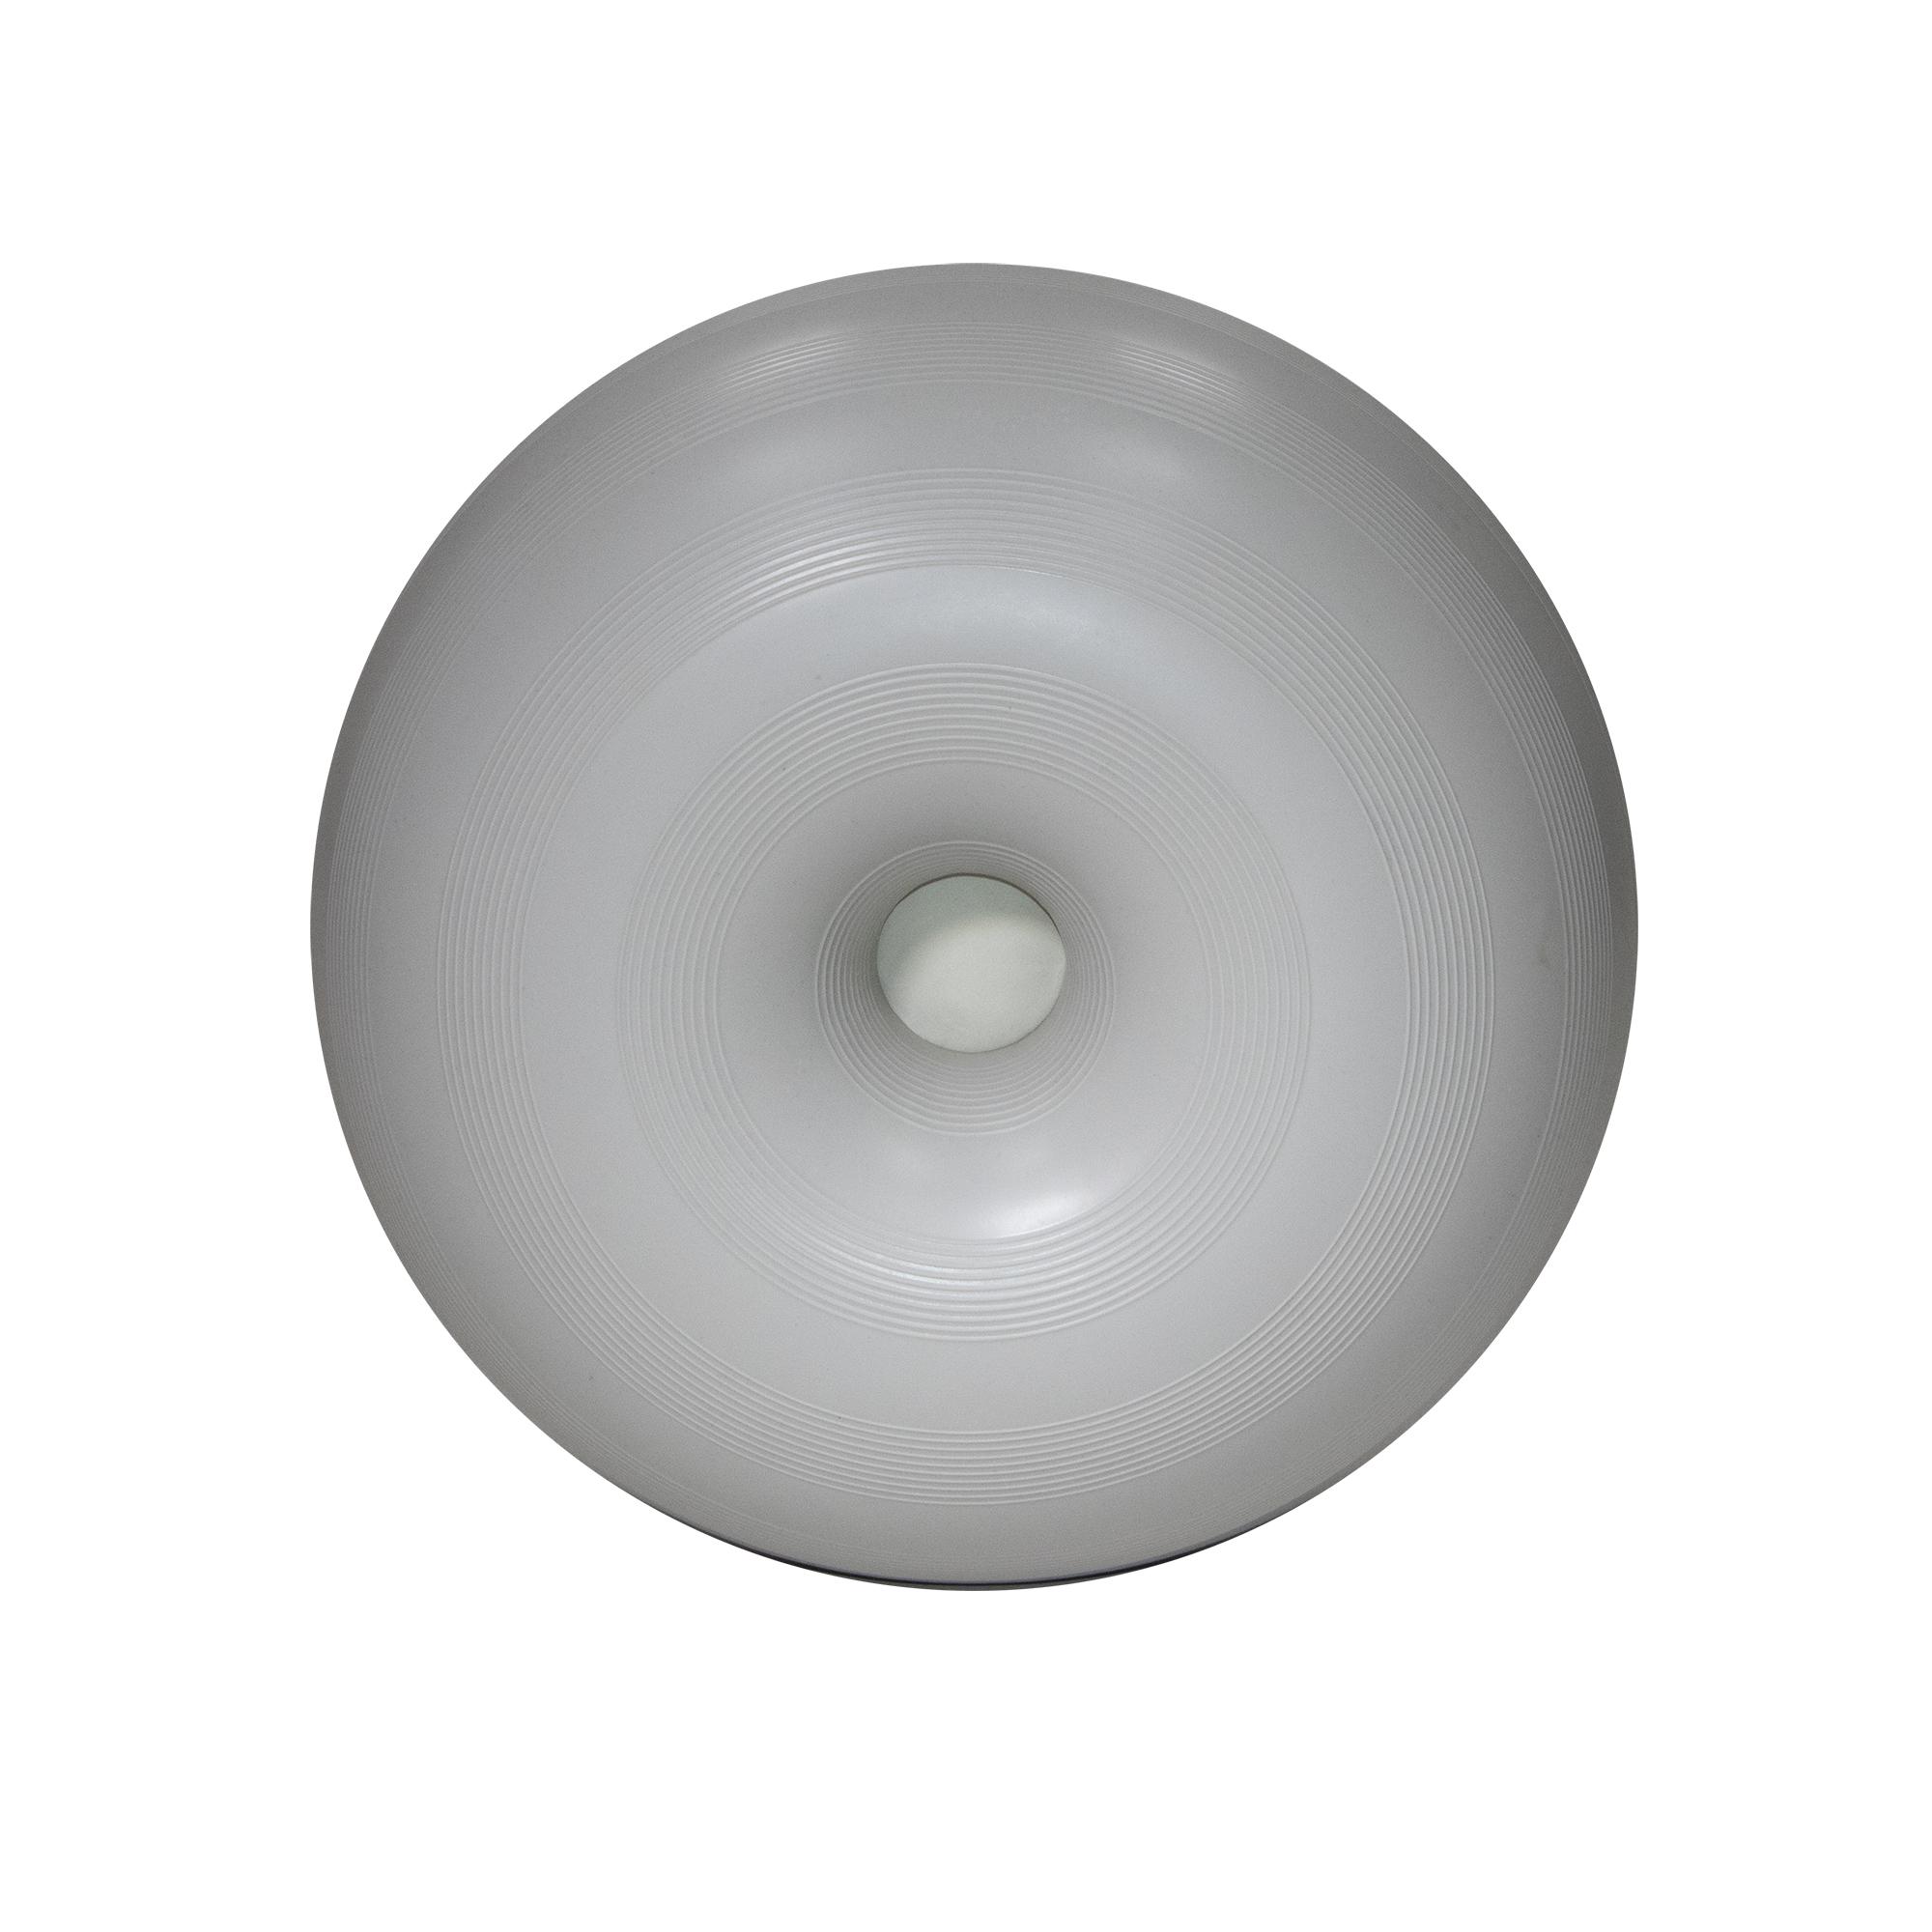 bObles Donut - Grey - NEW